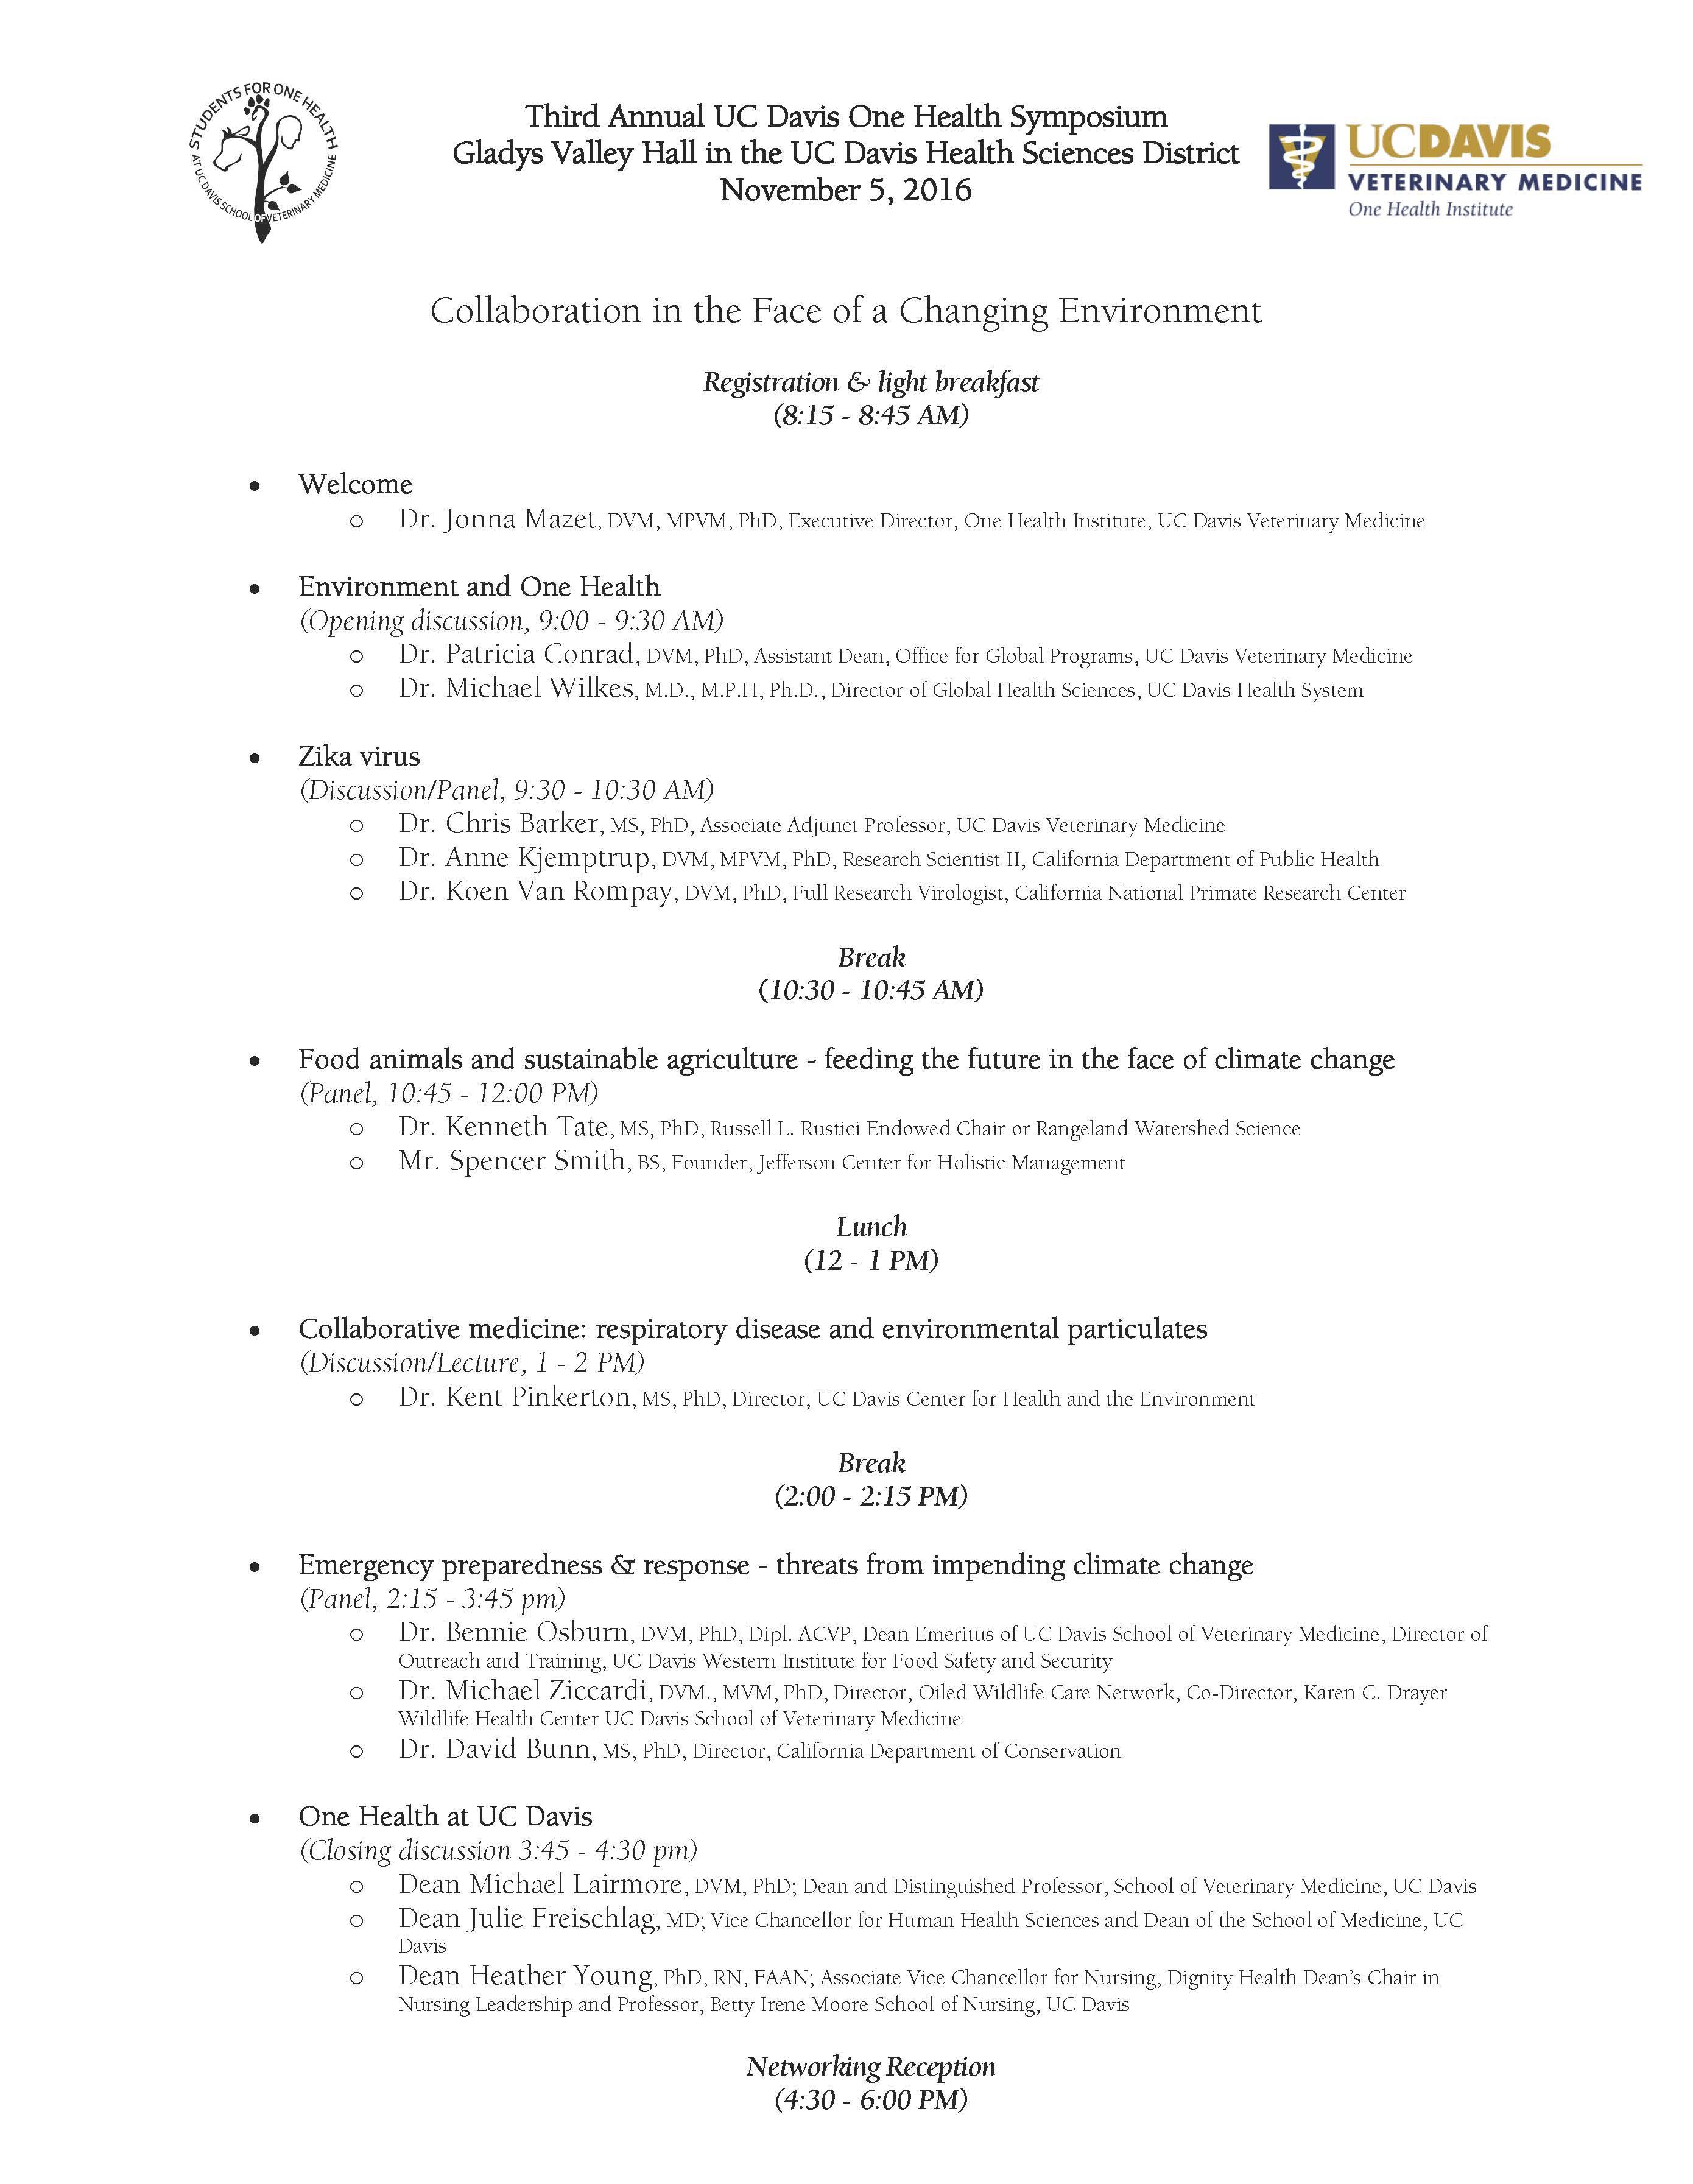 Agenda for One Health Symposium 2016